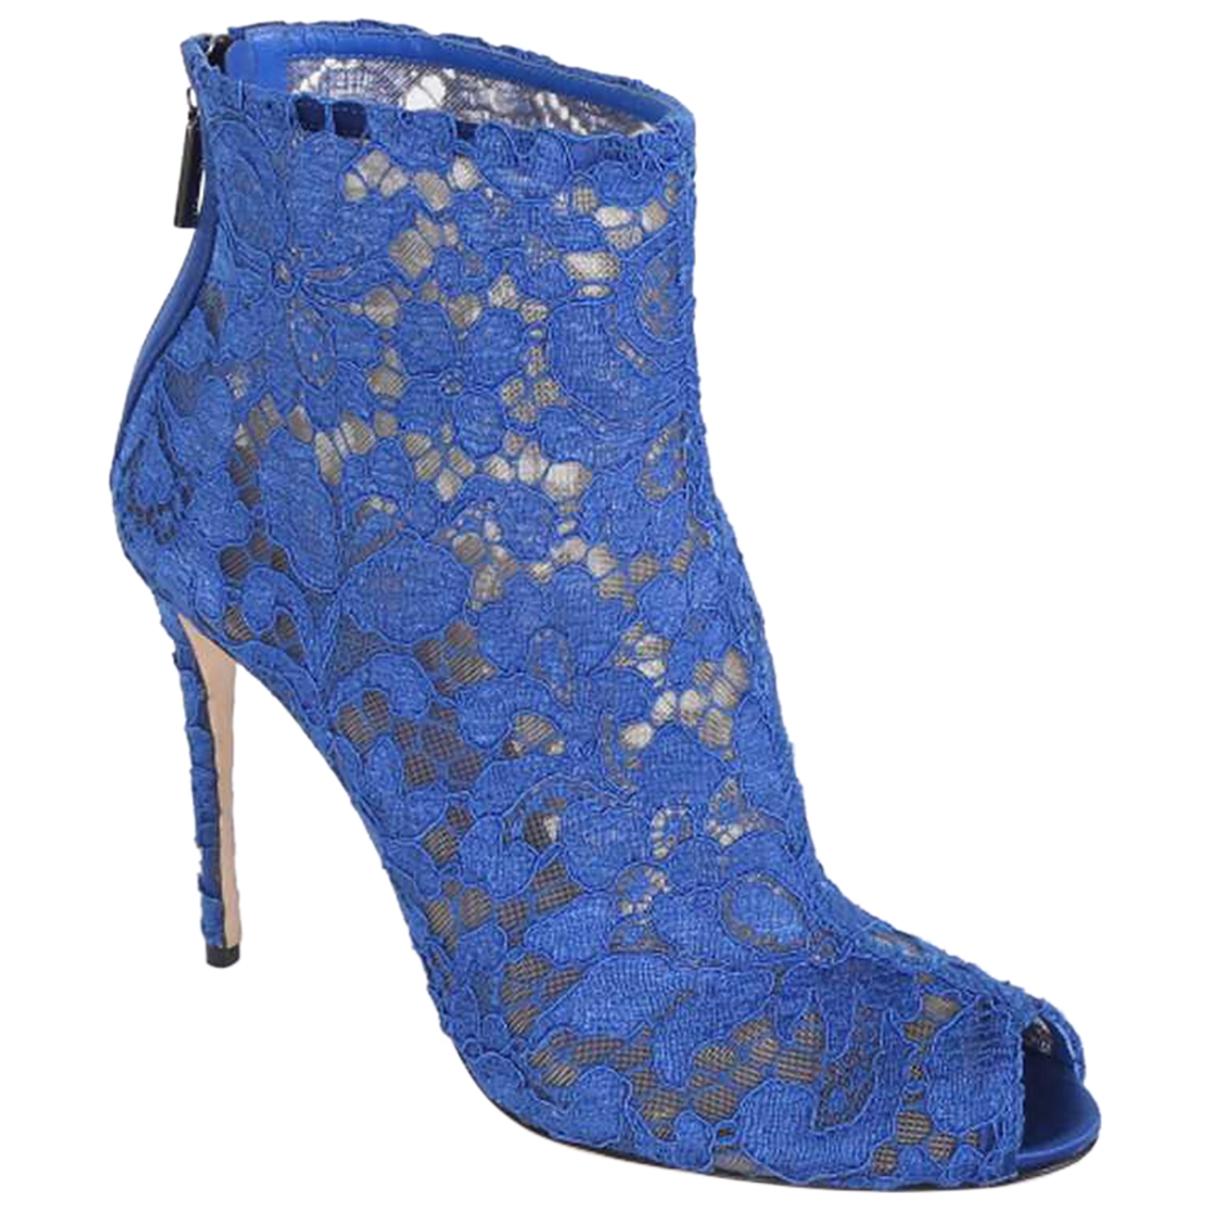 Dolce & Gabbana Taormina Stiefeletten in  Blau Leinen